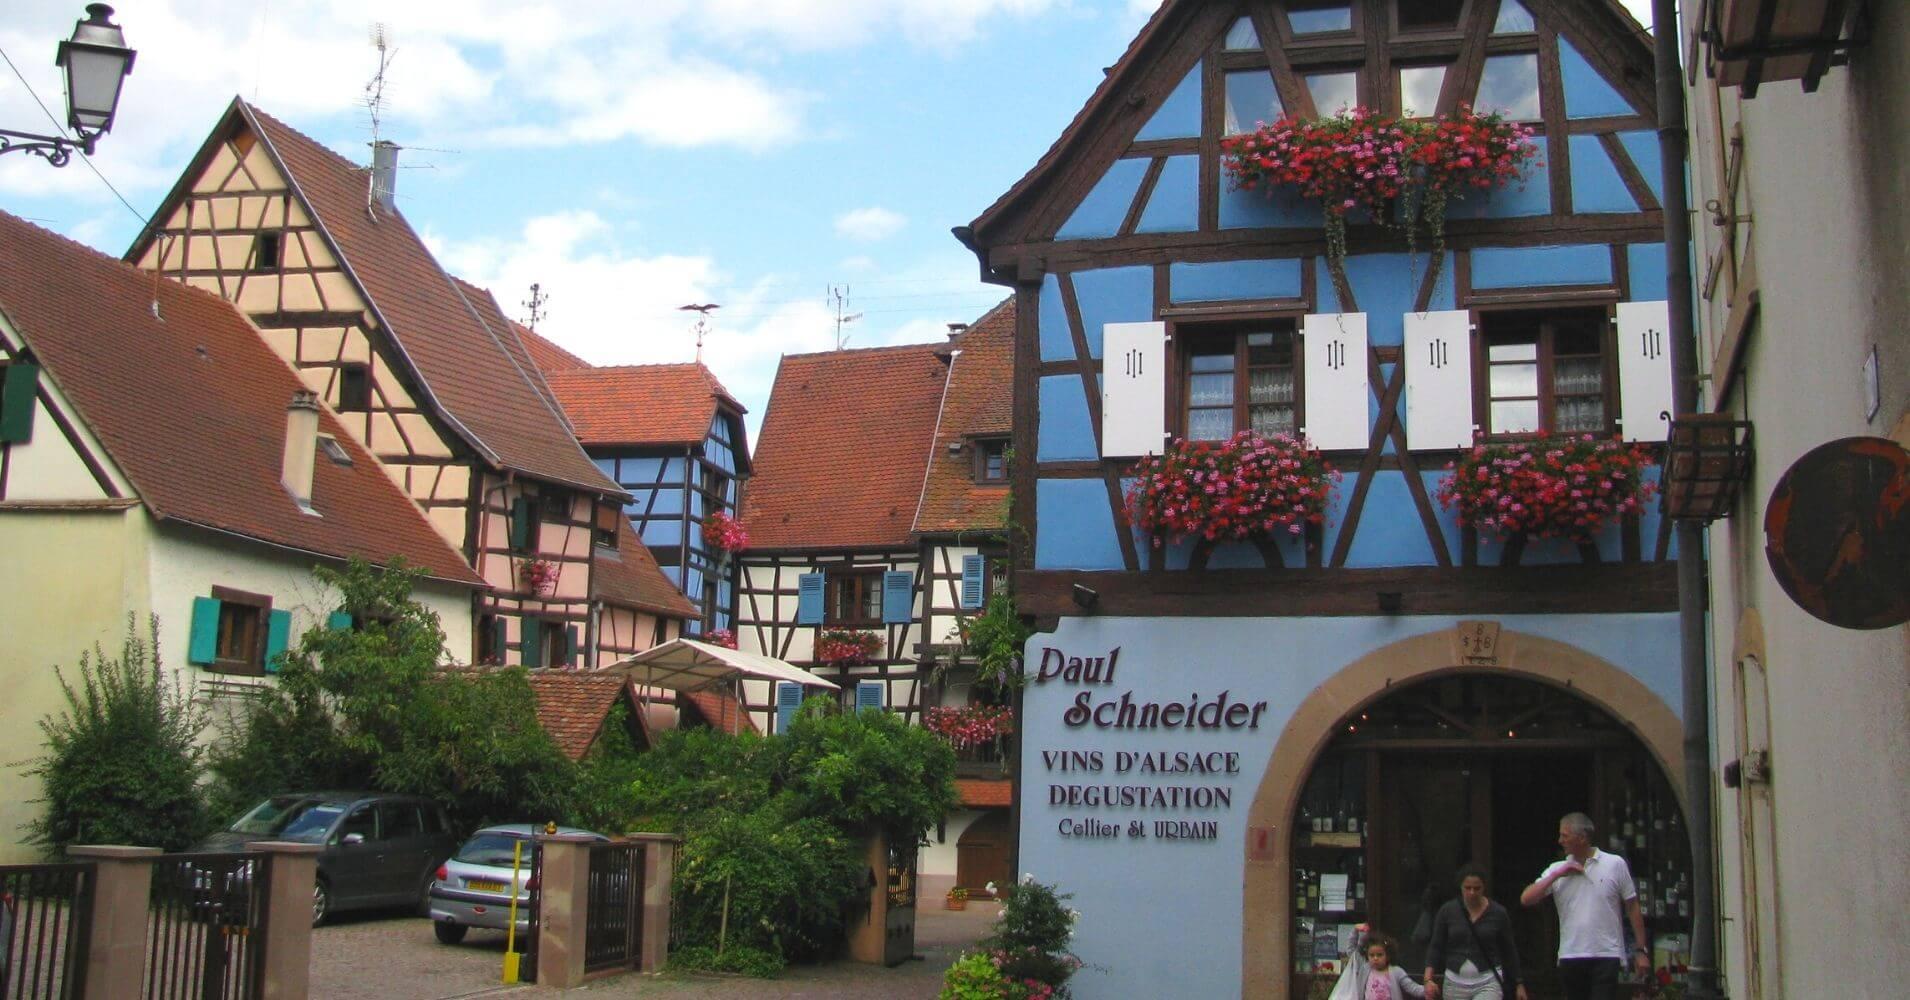 Ruta del Vino de Alsacia. Eguisheim. Alto Rin, Alsacia. Gran Este. Francia.